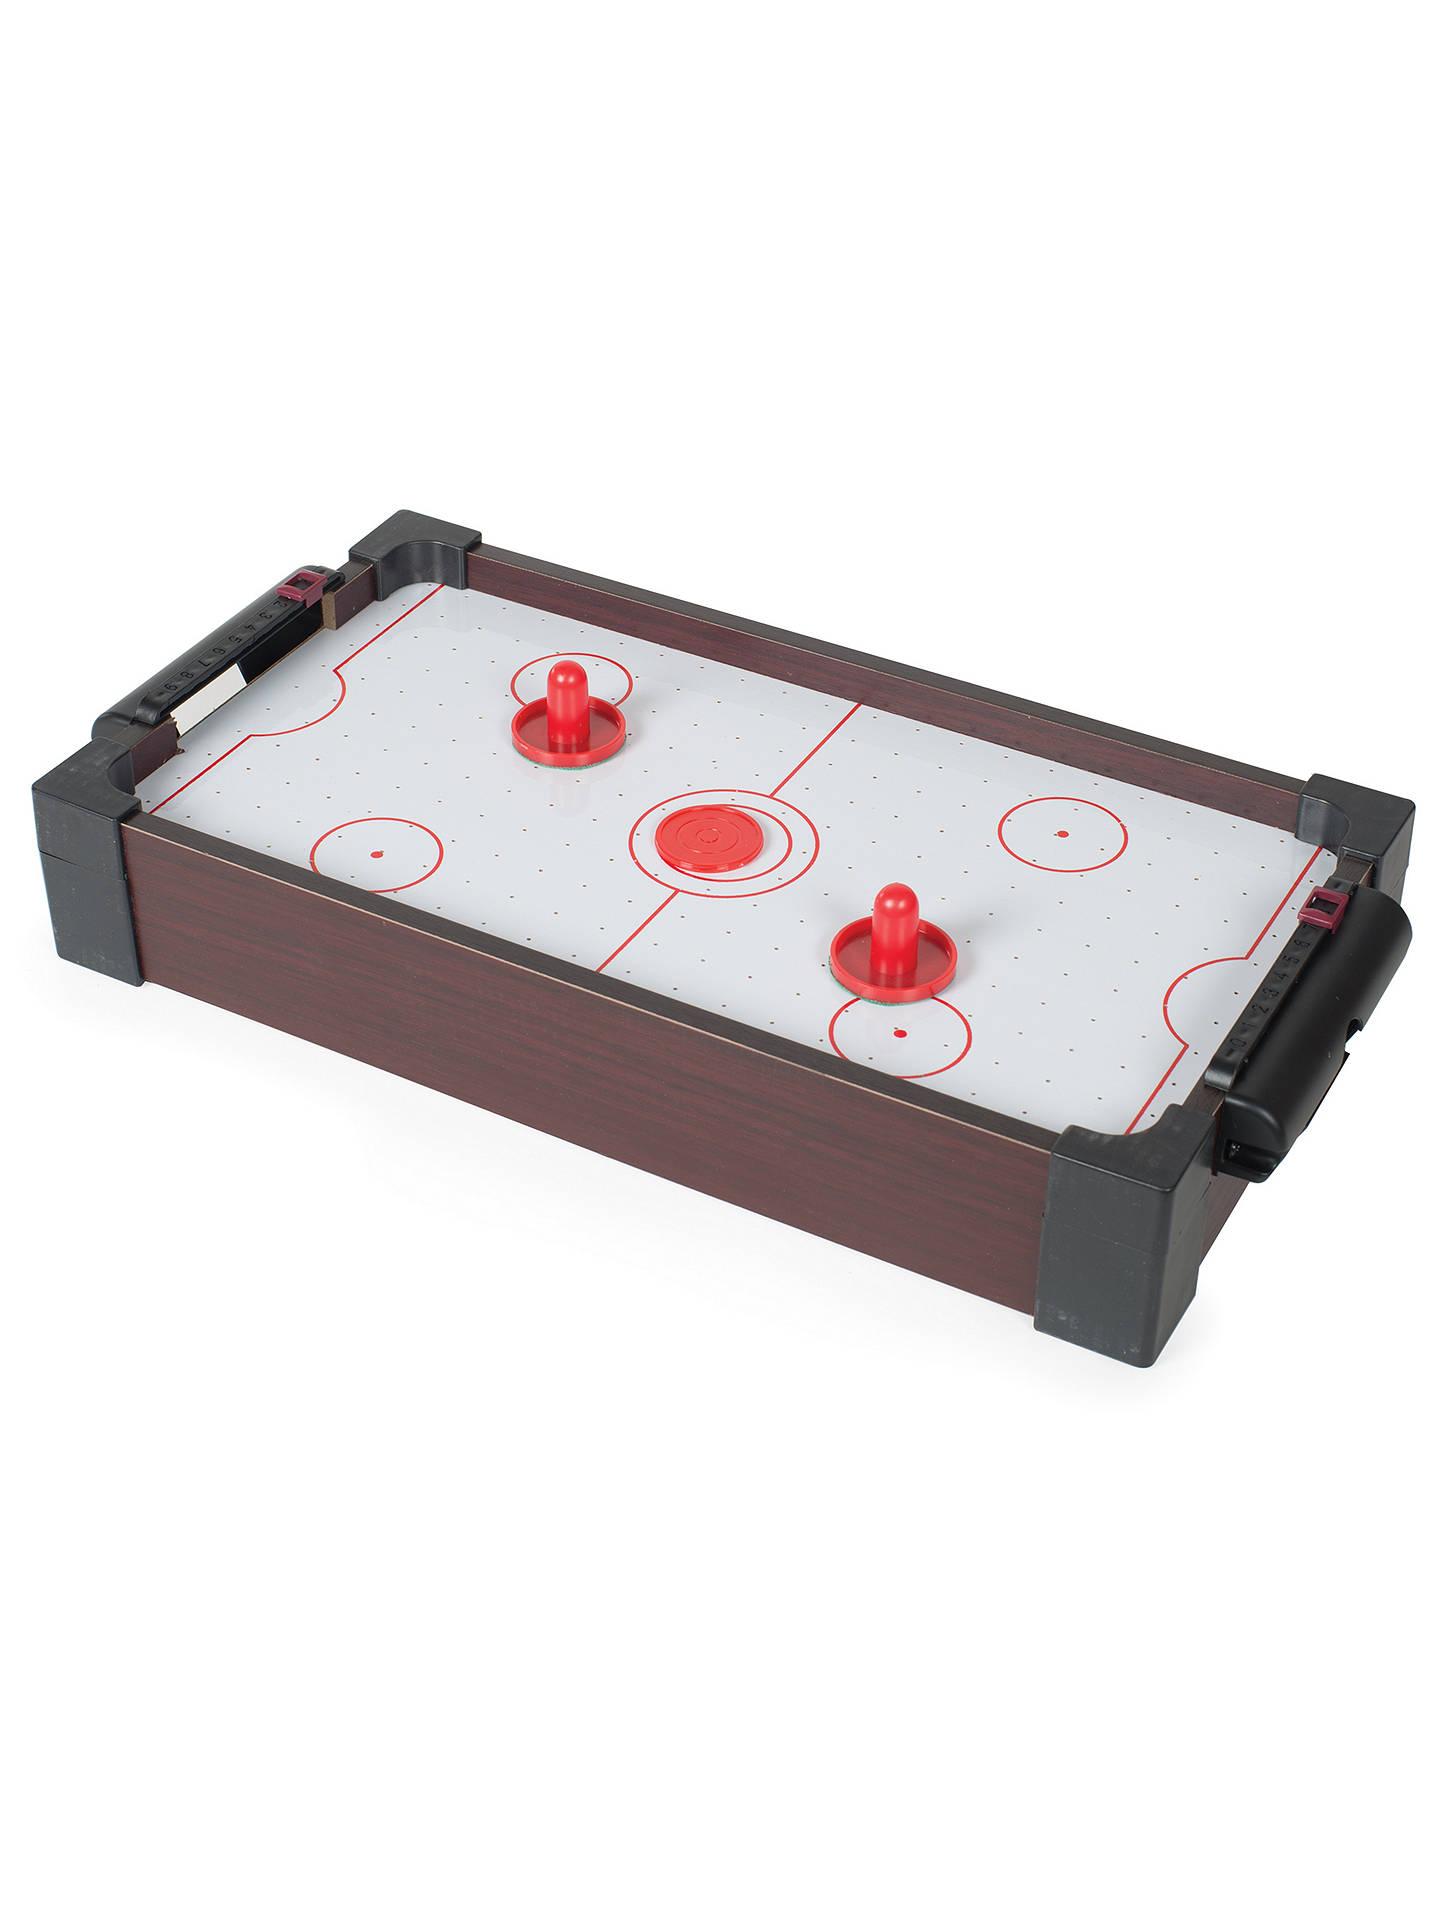 ... BuyJohn Lewis Mini One Foot Table Air Hockey Game Online At  Johnlewis.com